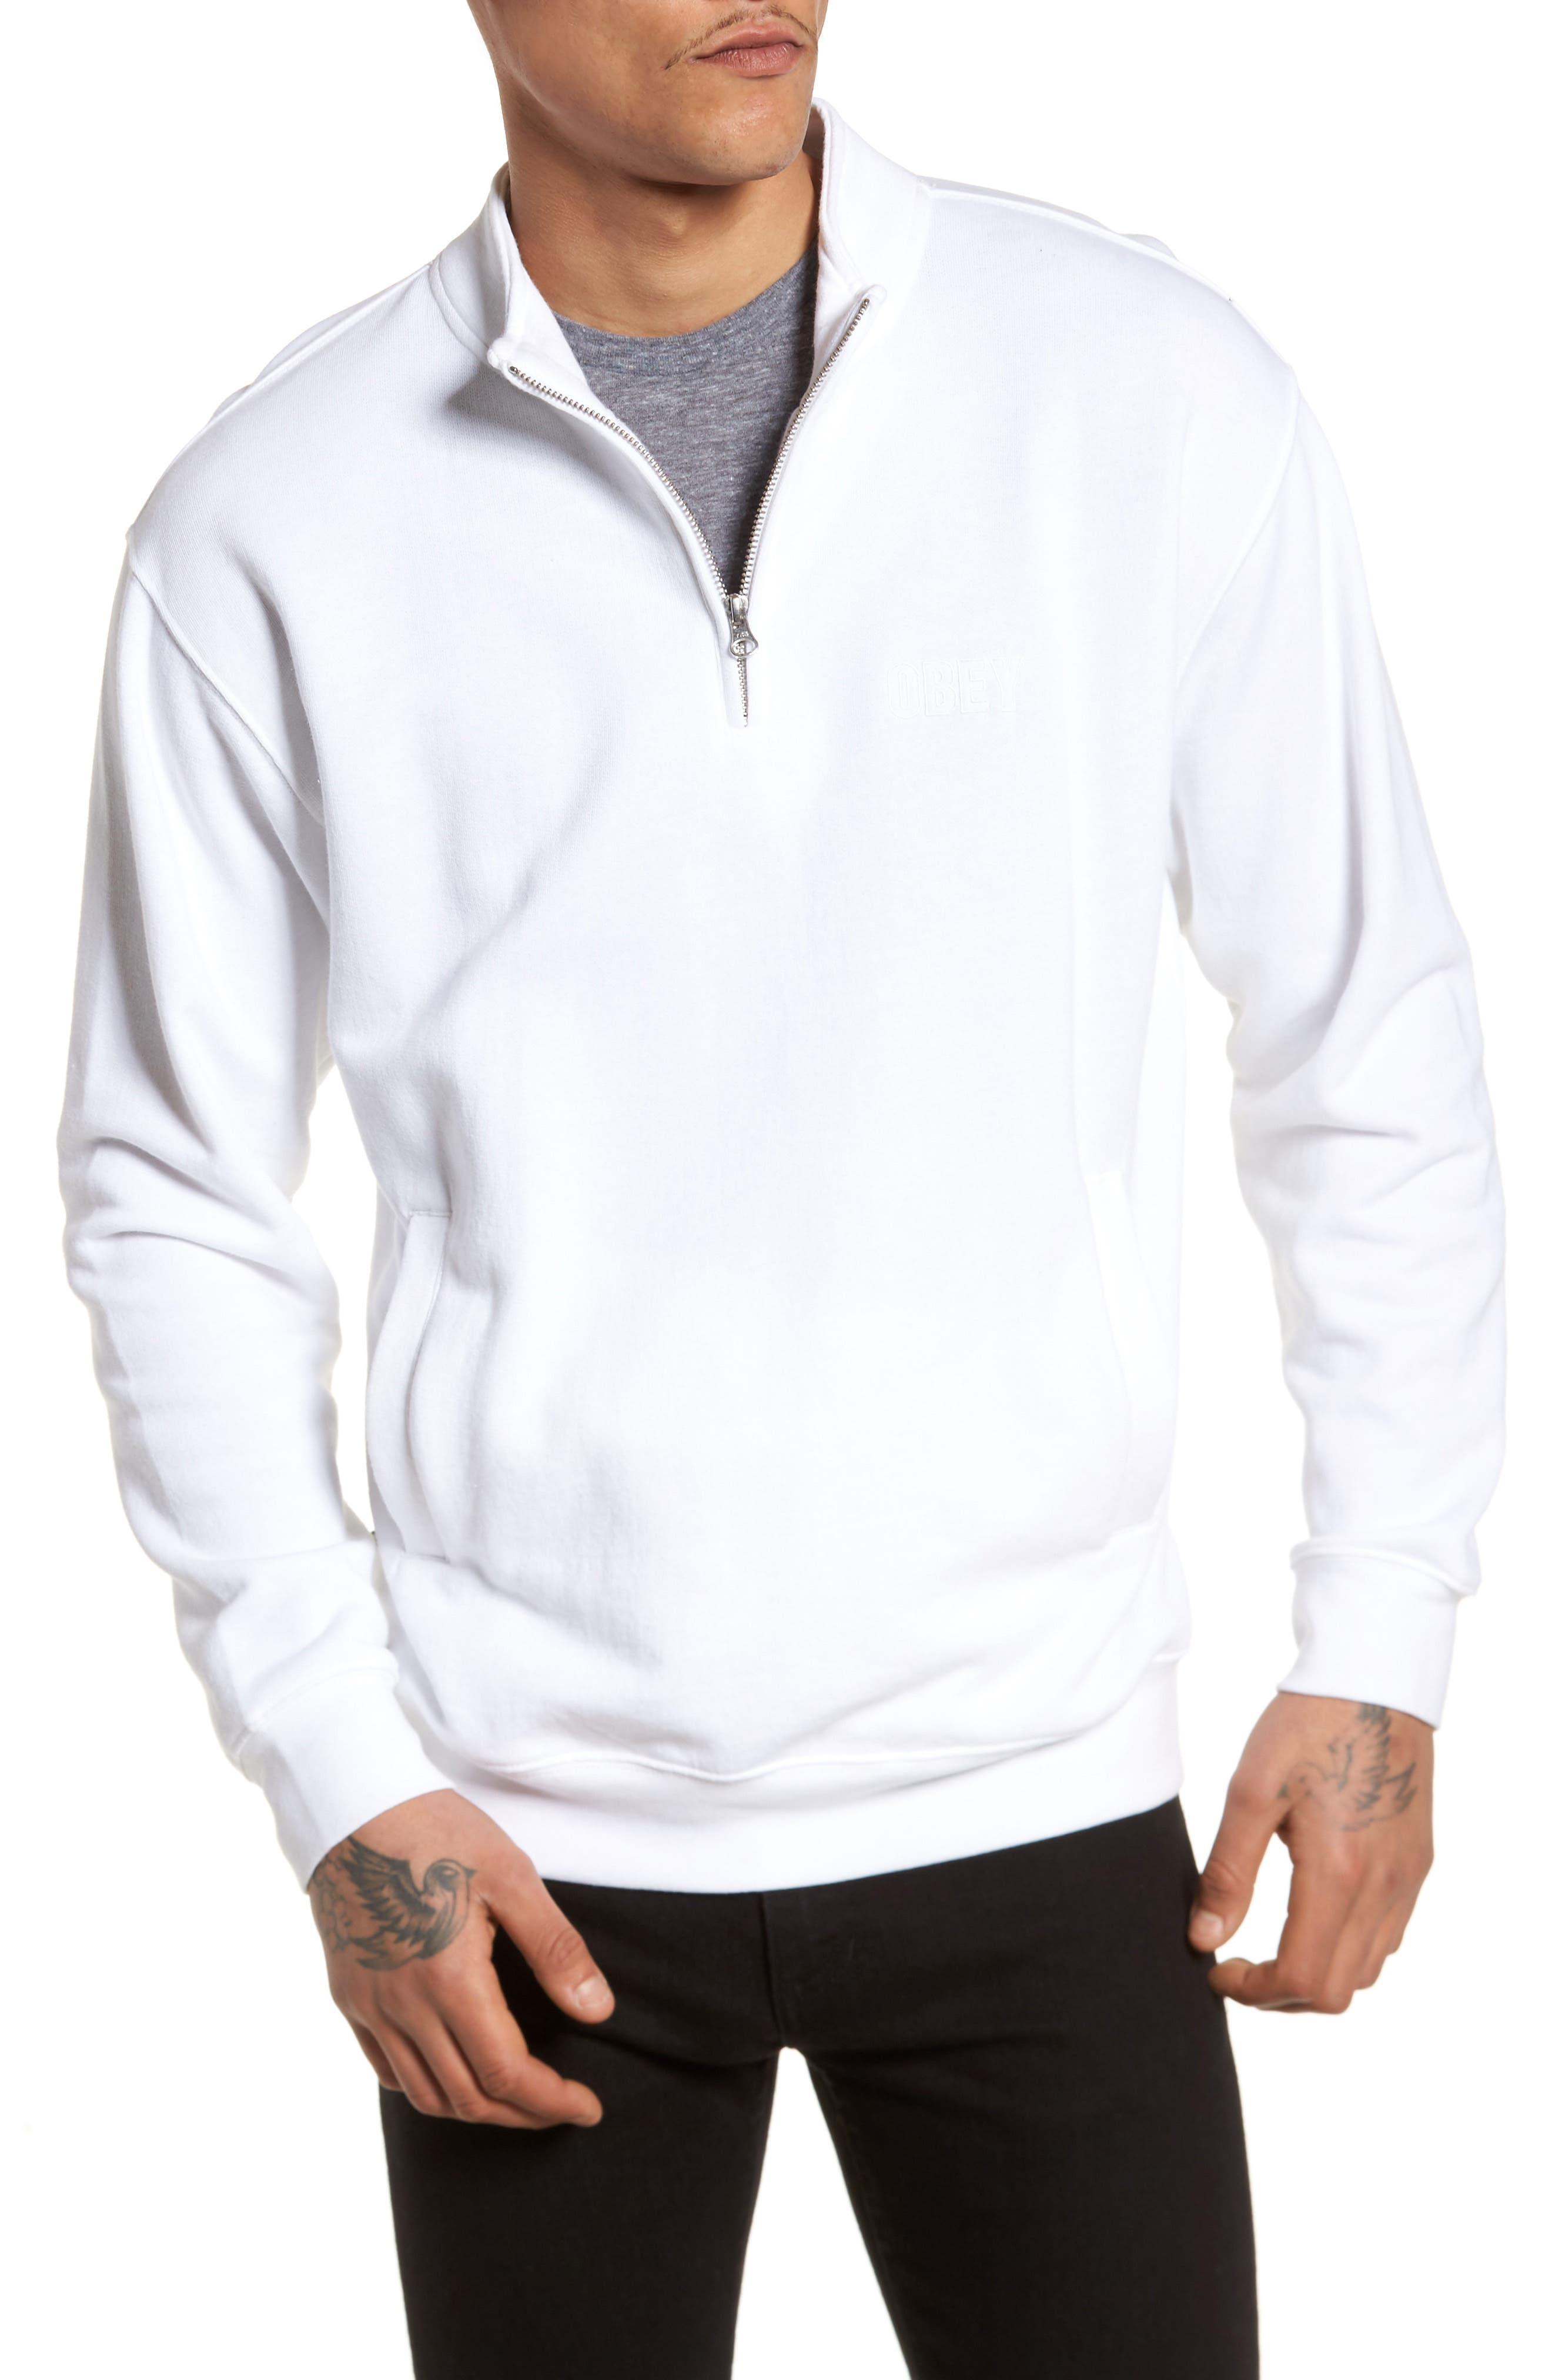 Obey Atomatic Quarter-Zip Fleece Pullover